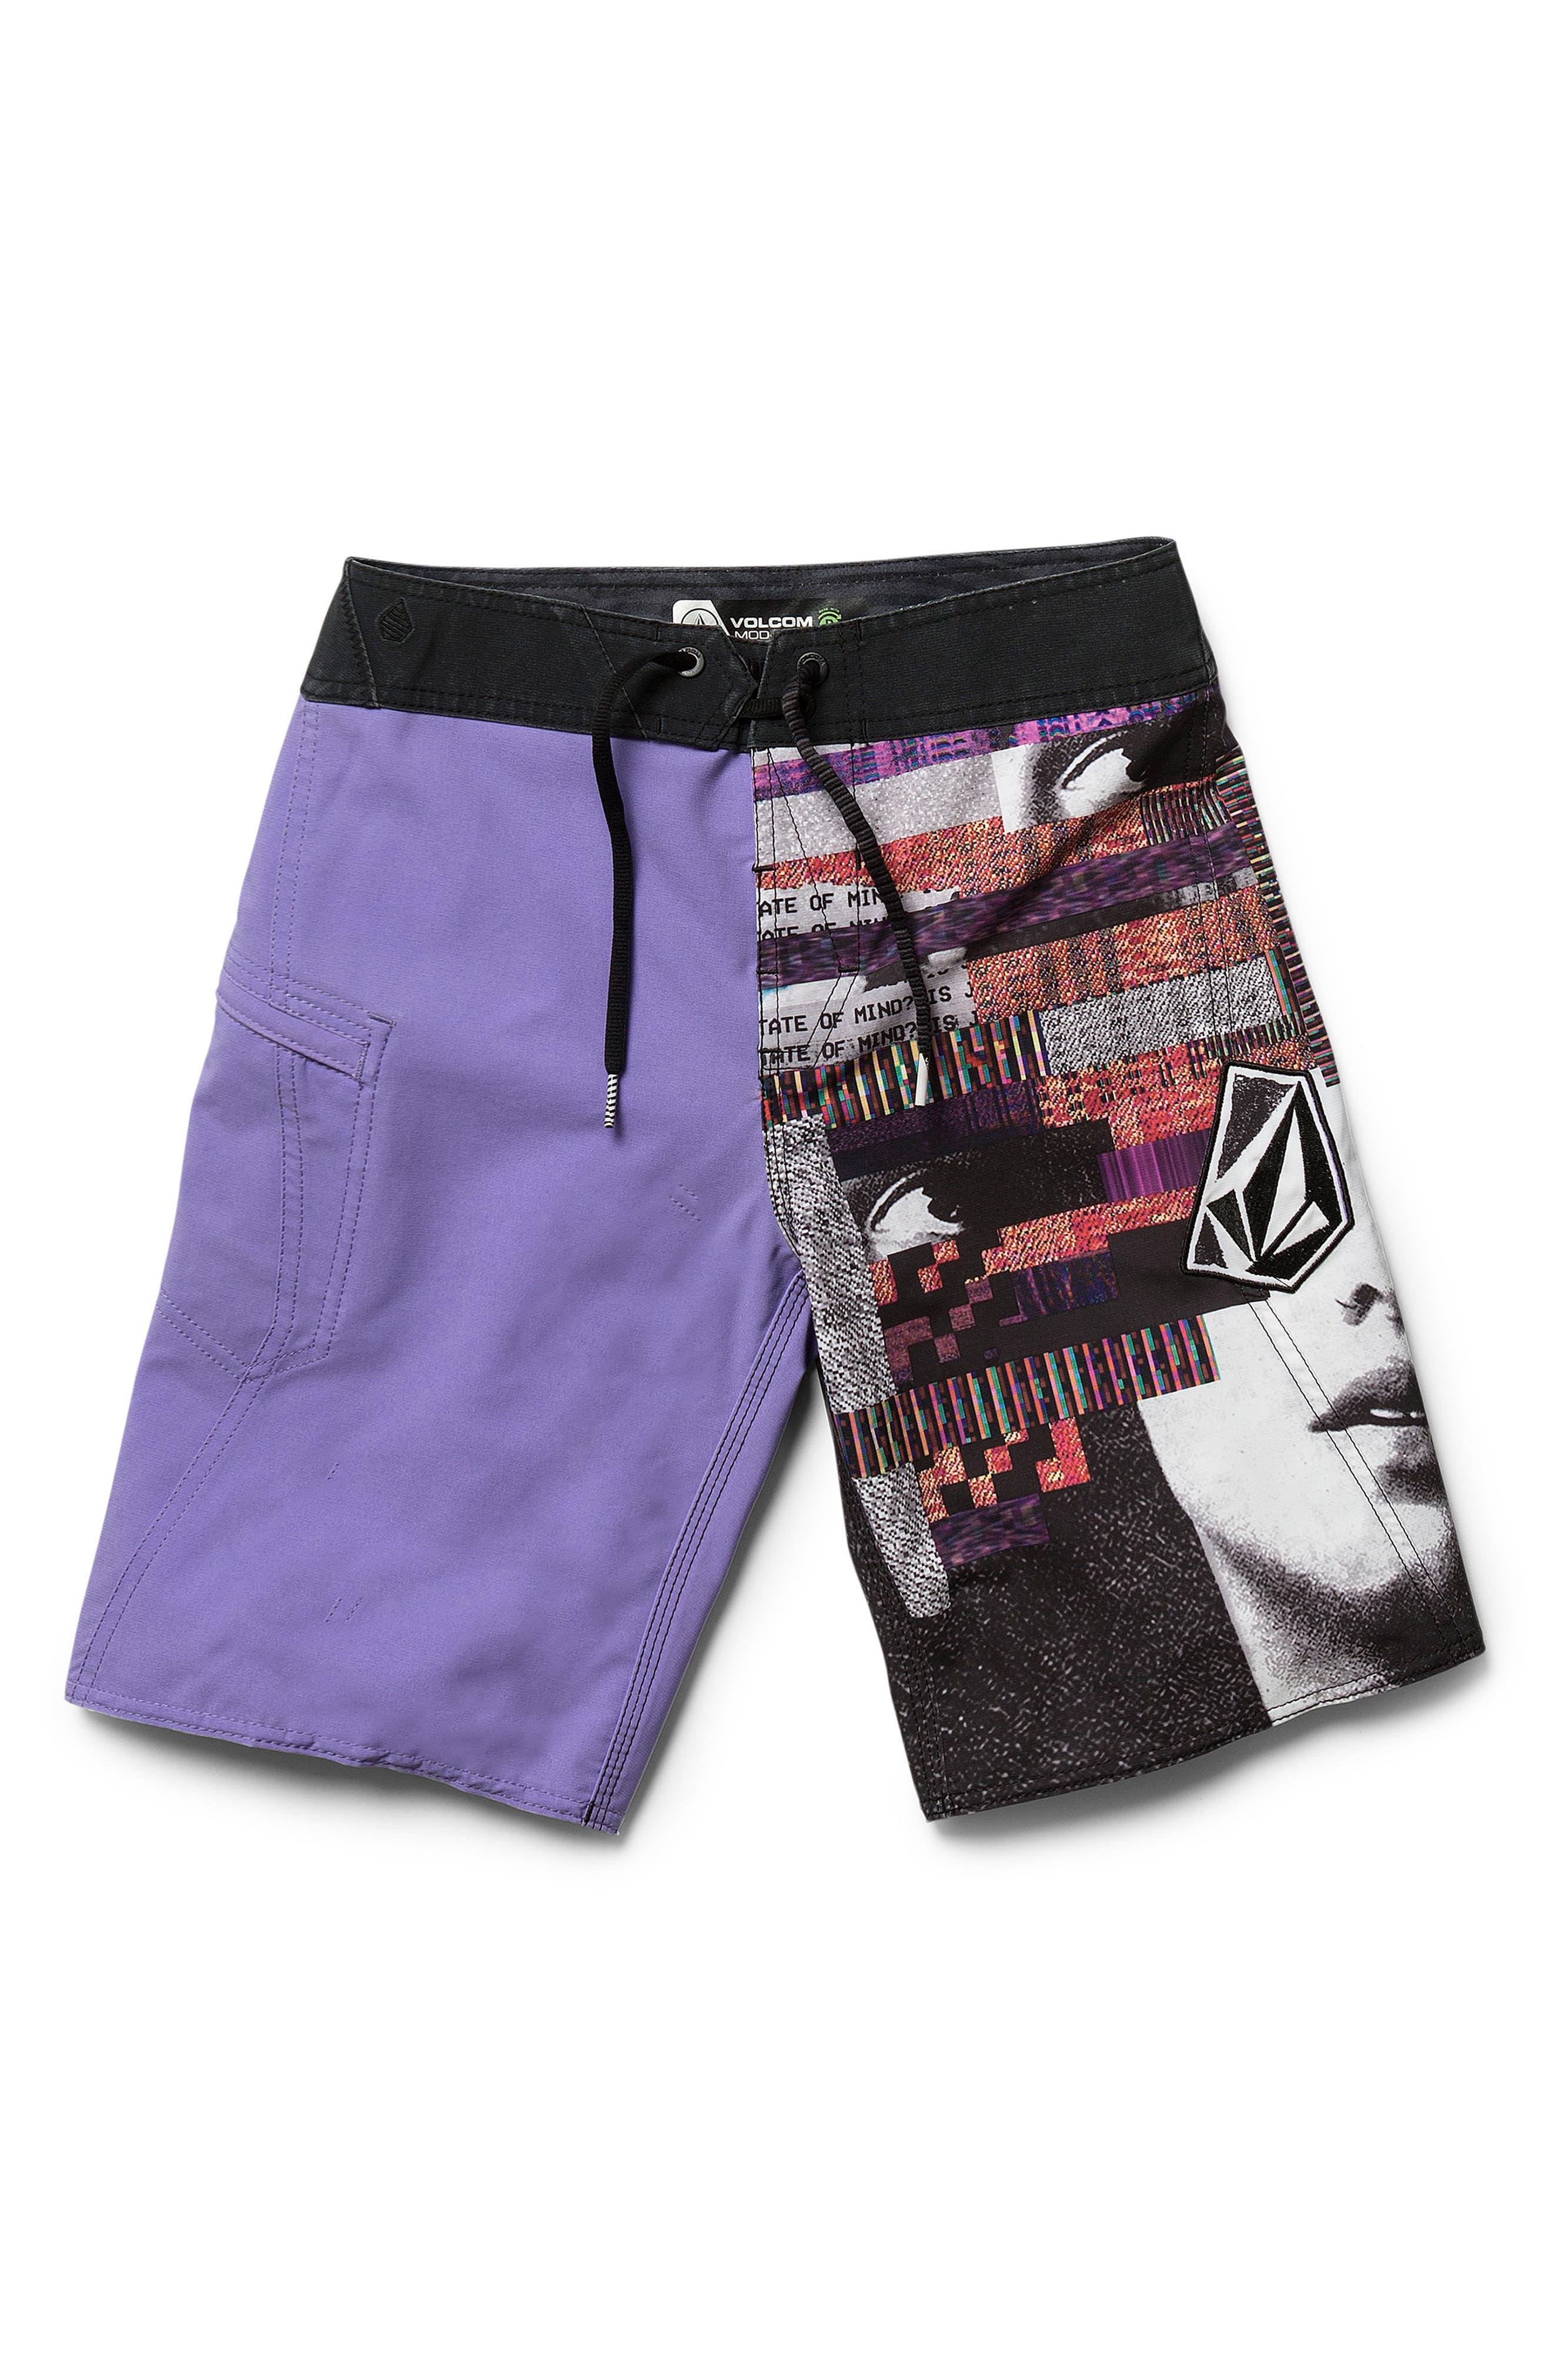 Noise Mod Board Shorts,                         Main,                         color, 512